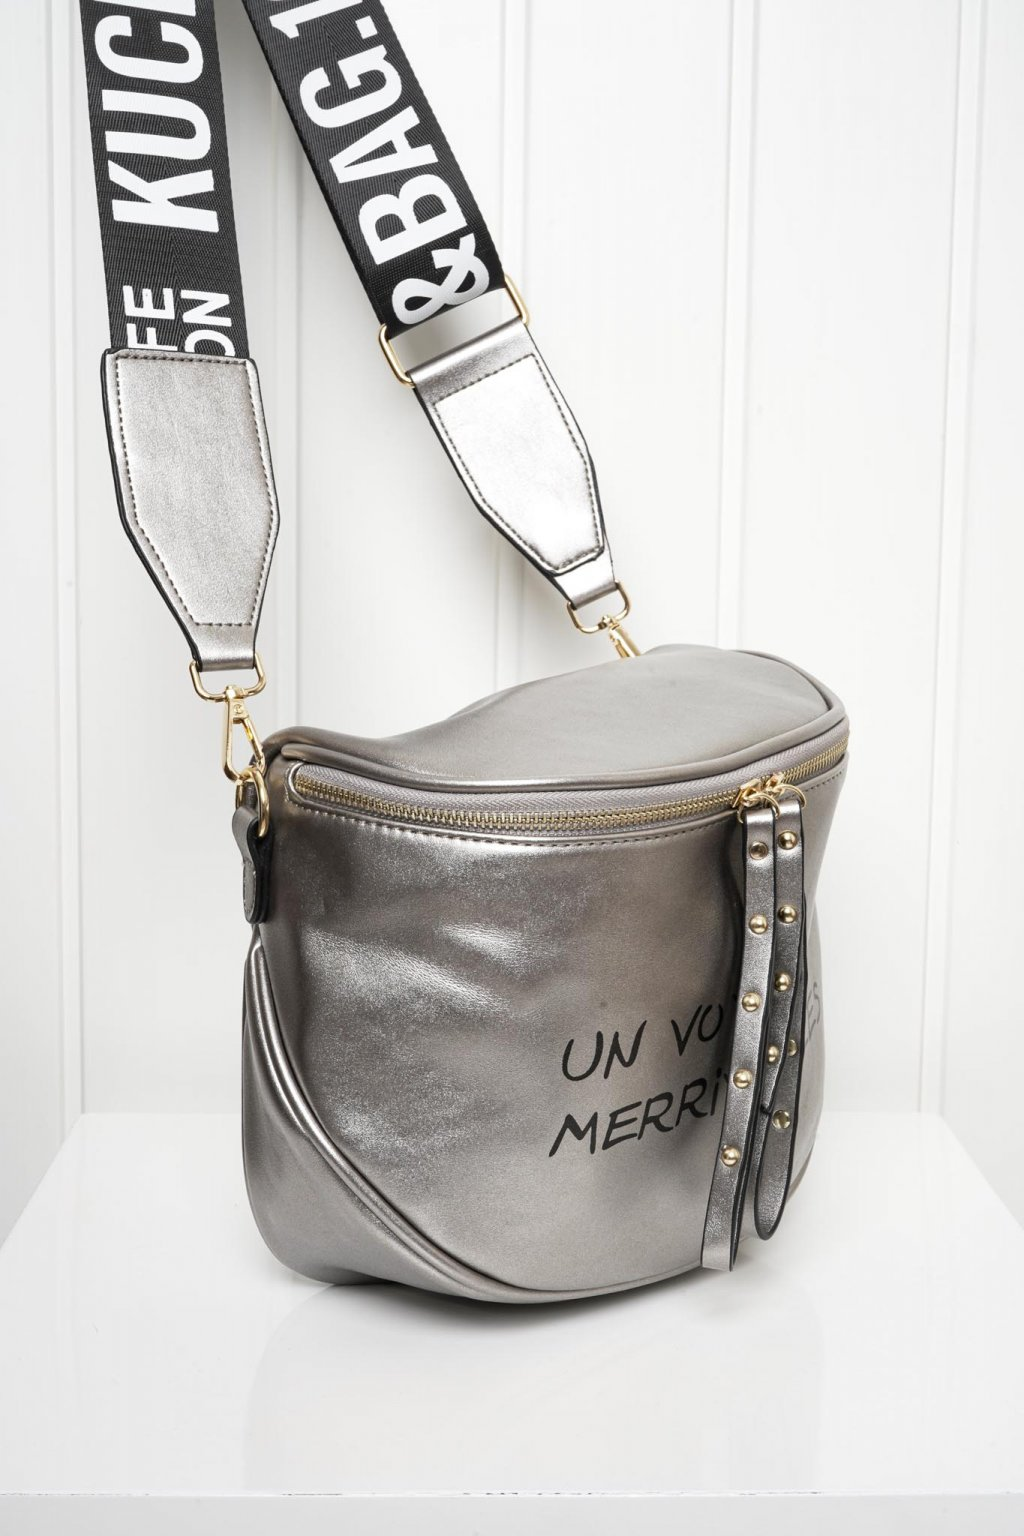 Kabelka, crossbody, ruksak, shopping bag, shopperka, 178